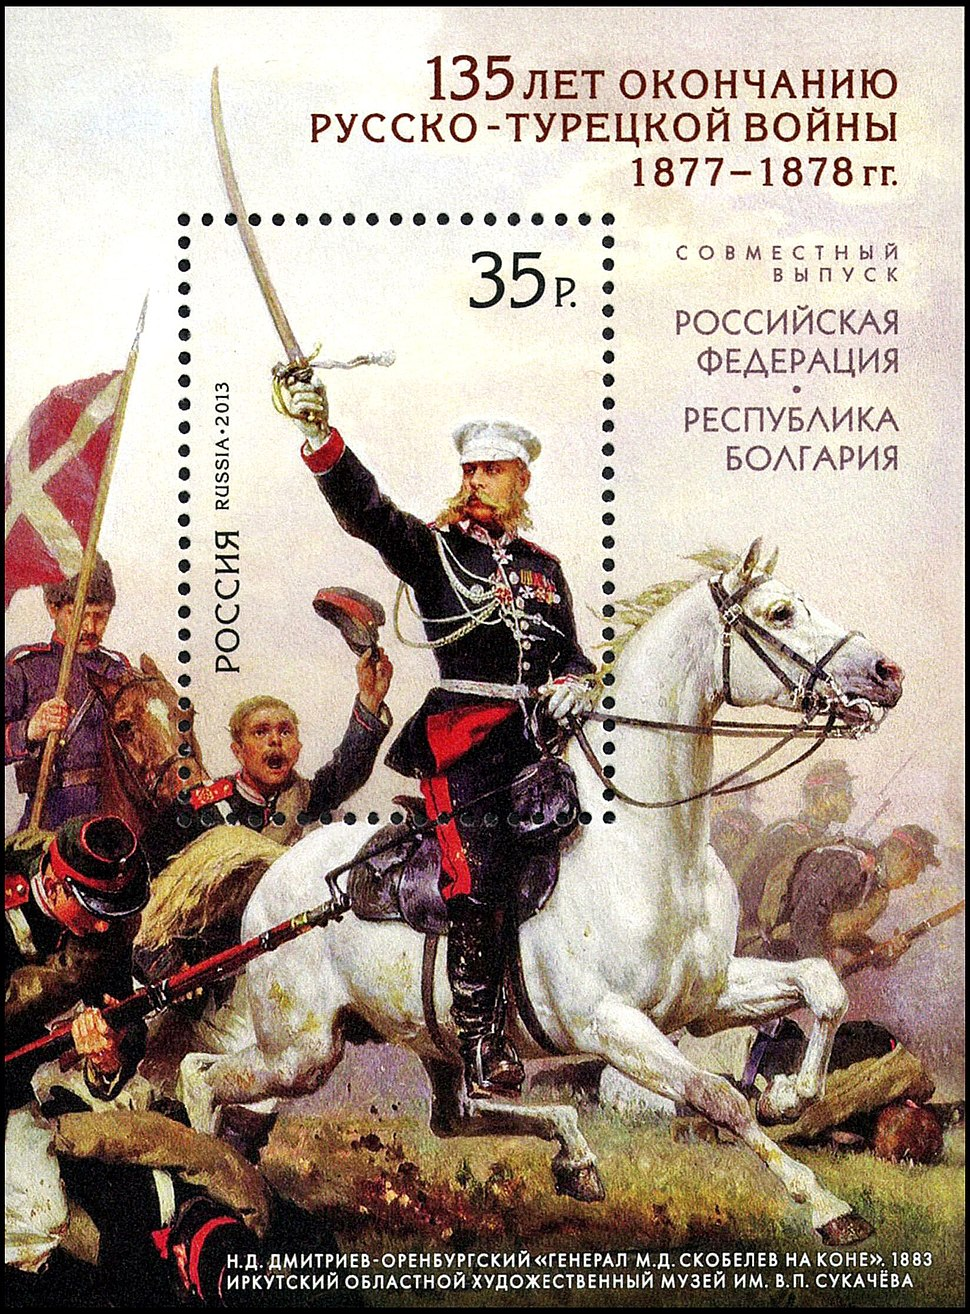 Stamp of Russia 2013 No 1686 Russo-Turkish War 1877-78